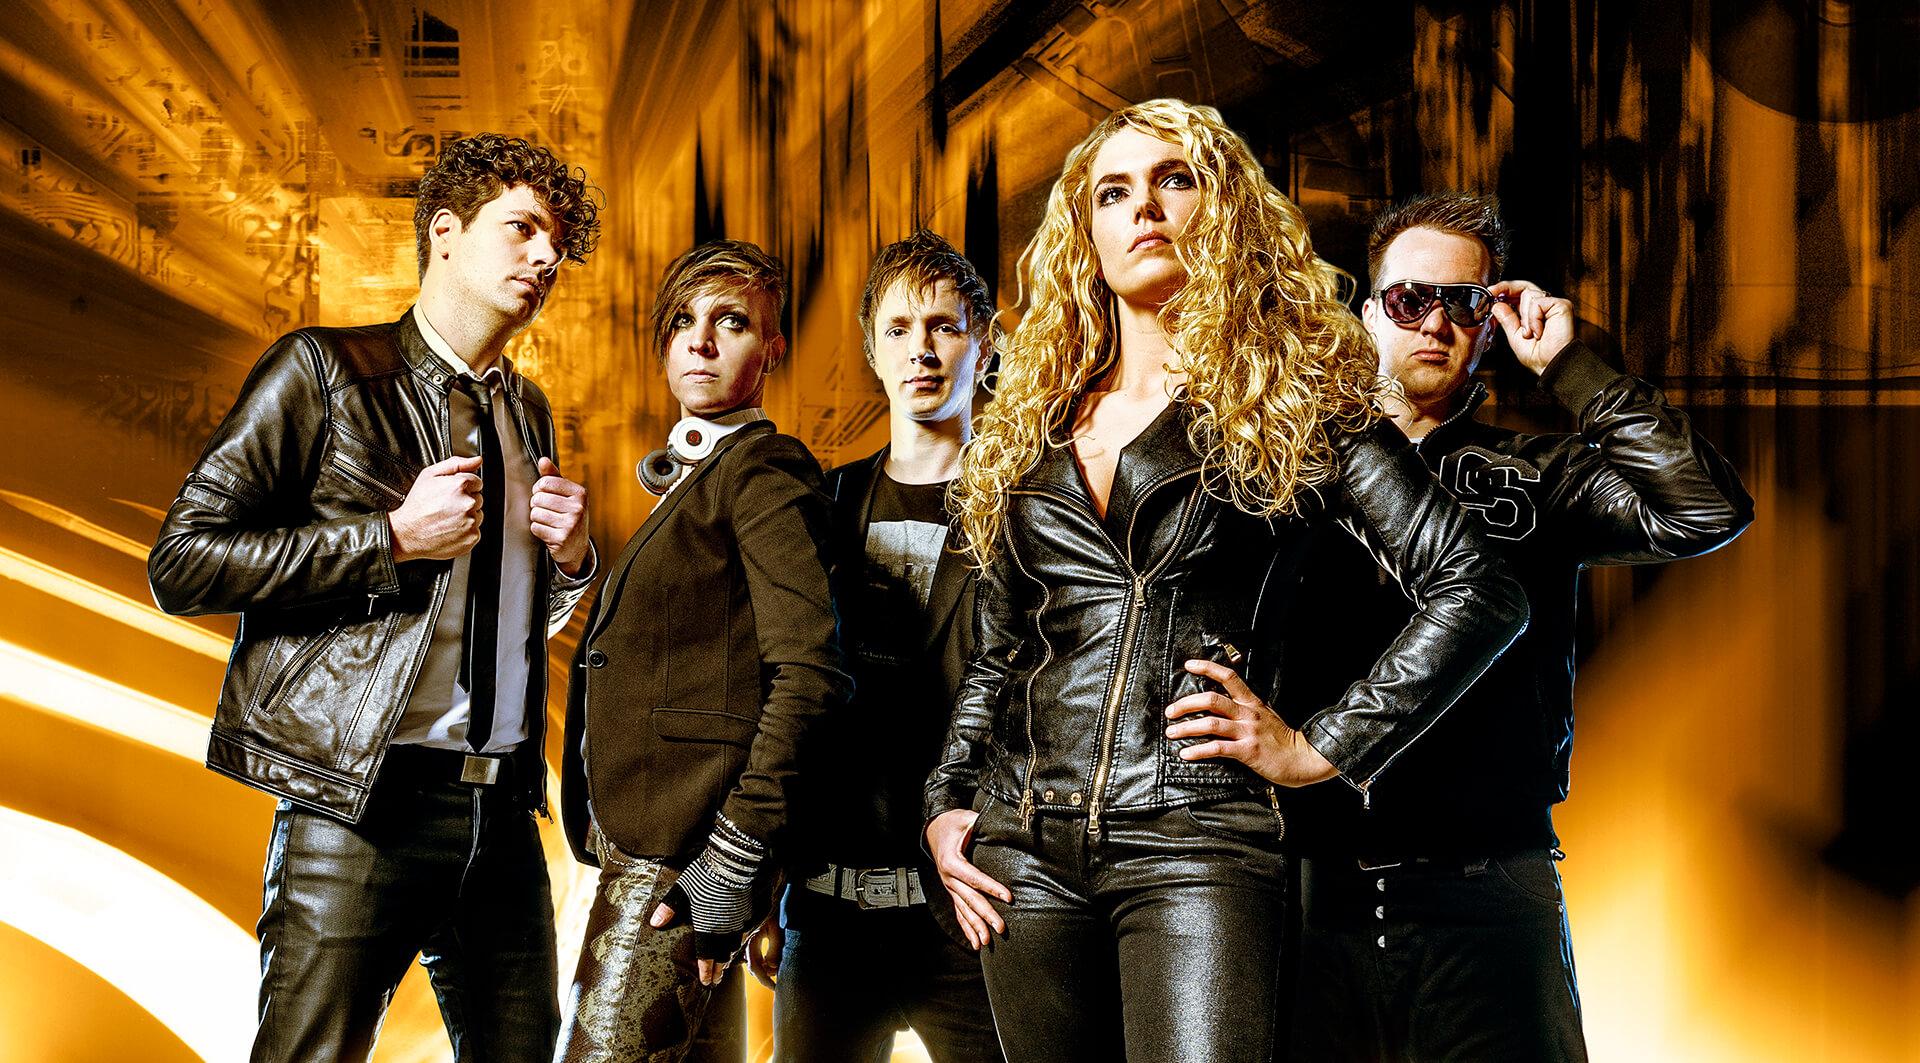 Q5 New Style band coverband muziek performers licht oranje muzikanten leer zwart persfoto boeken buchen hire book